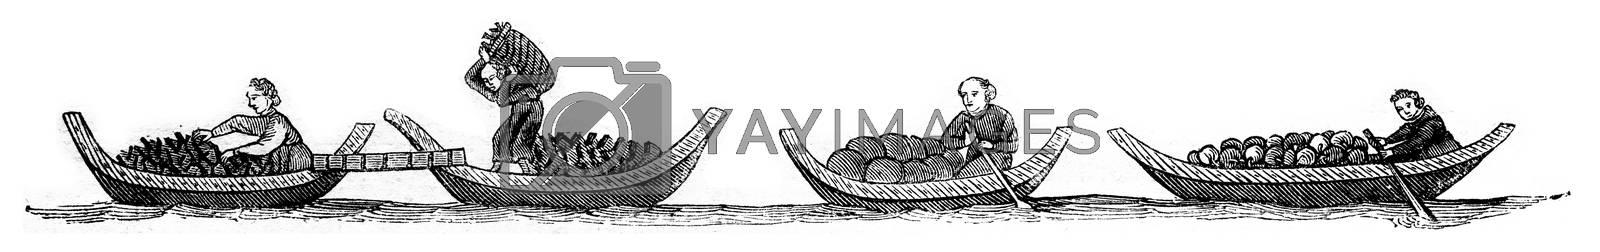 Port coal, fruits boats, vintage engraved illustration. Magasin Pittoresque 1846.